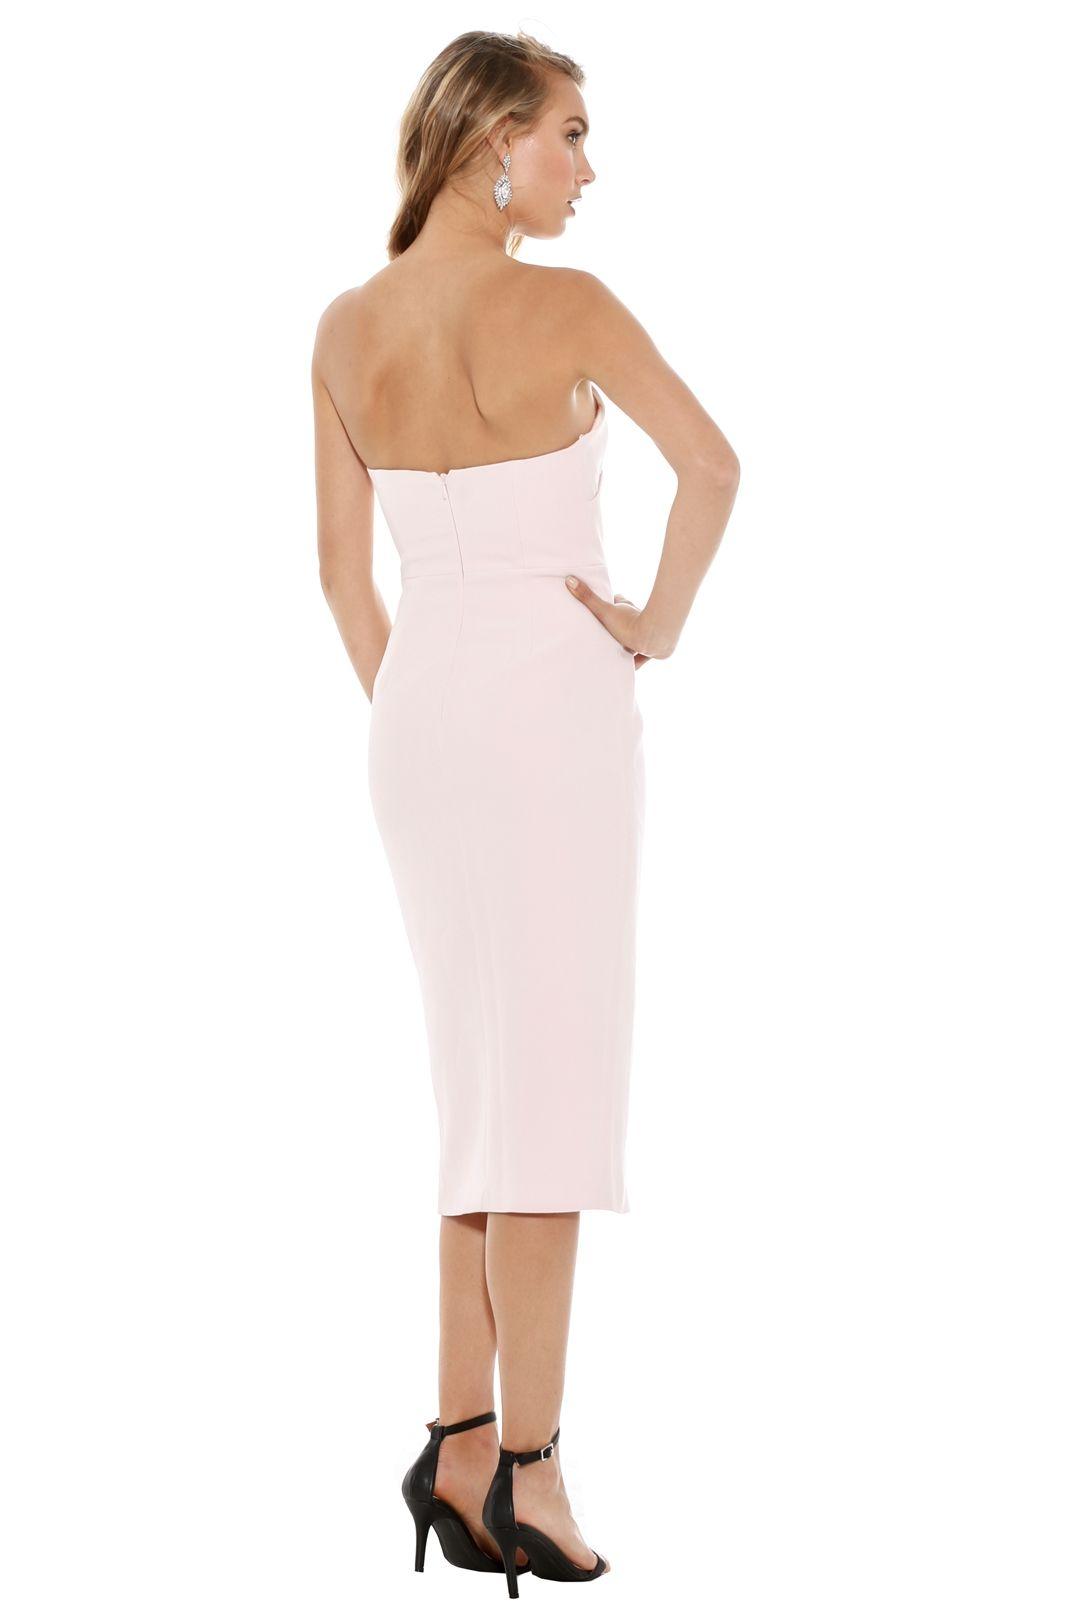 Talulah - Could It Be Midi Dress - Light Pink - Back